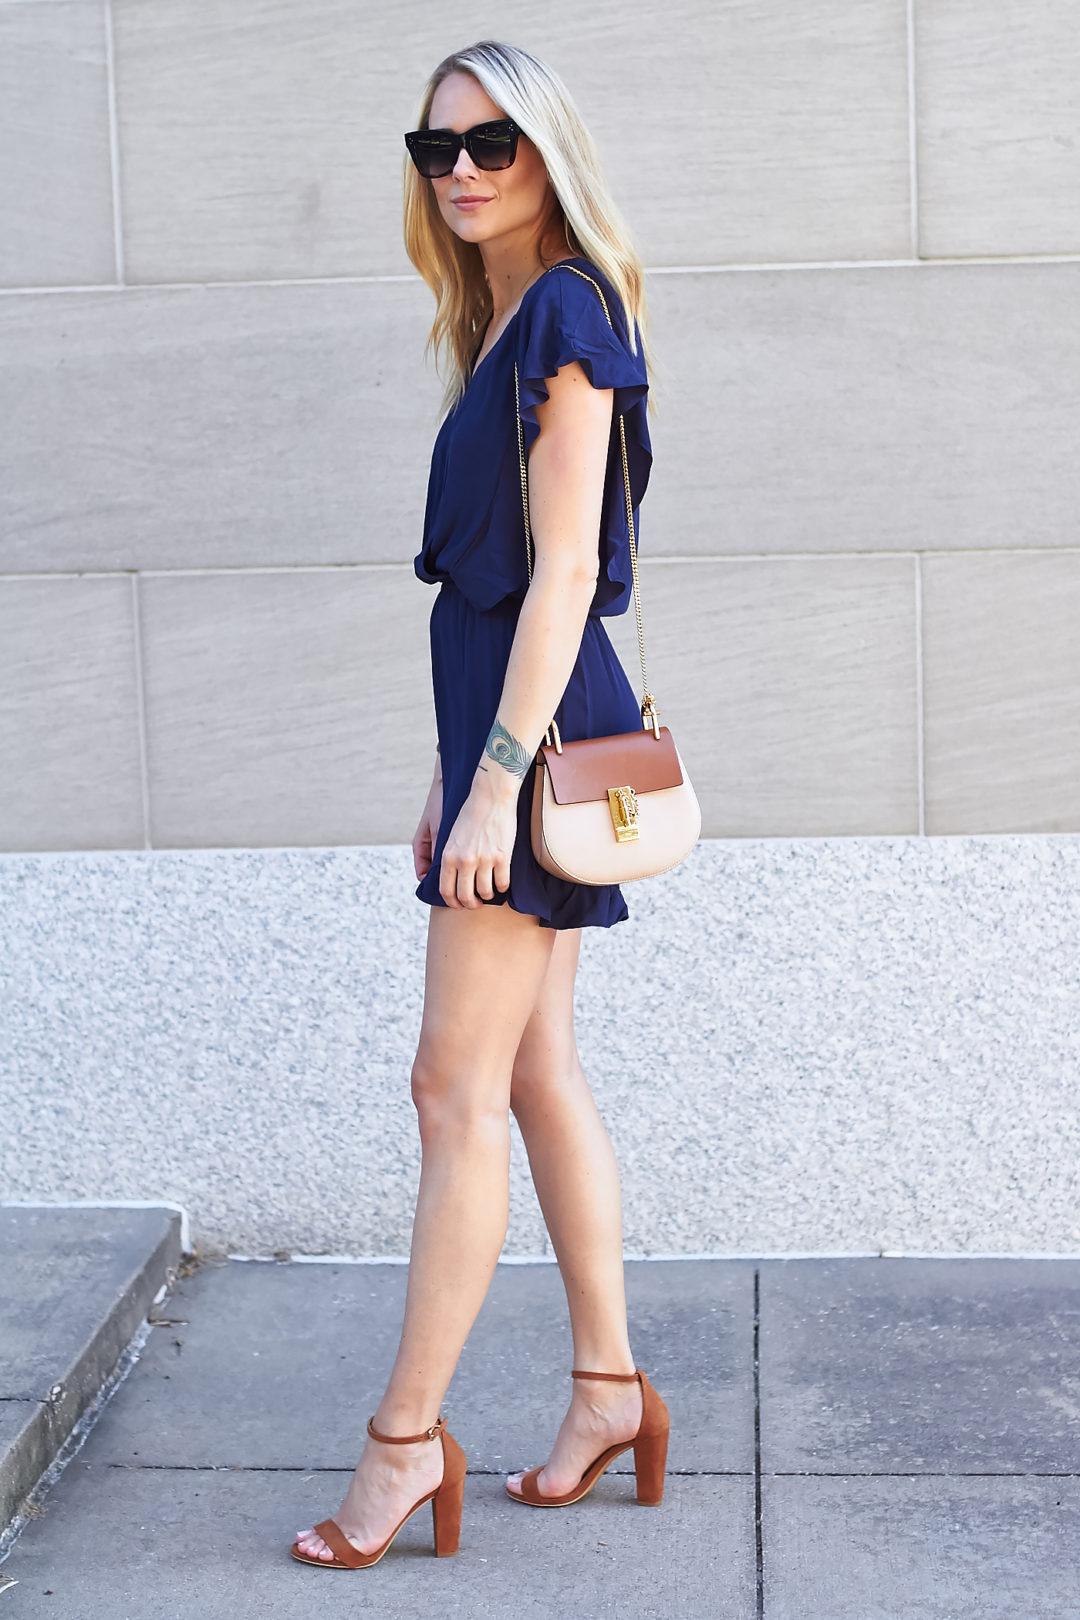 fashion-jackson-chloe-drew-handbag-hm-navy-blue-ruffle-romper-tan-ankle-strap-sandals